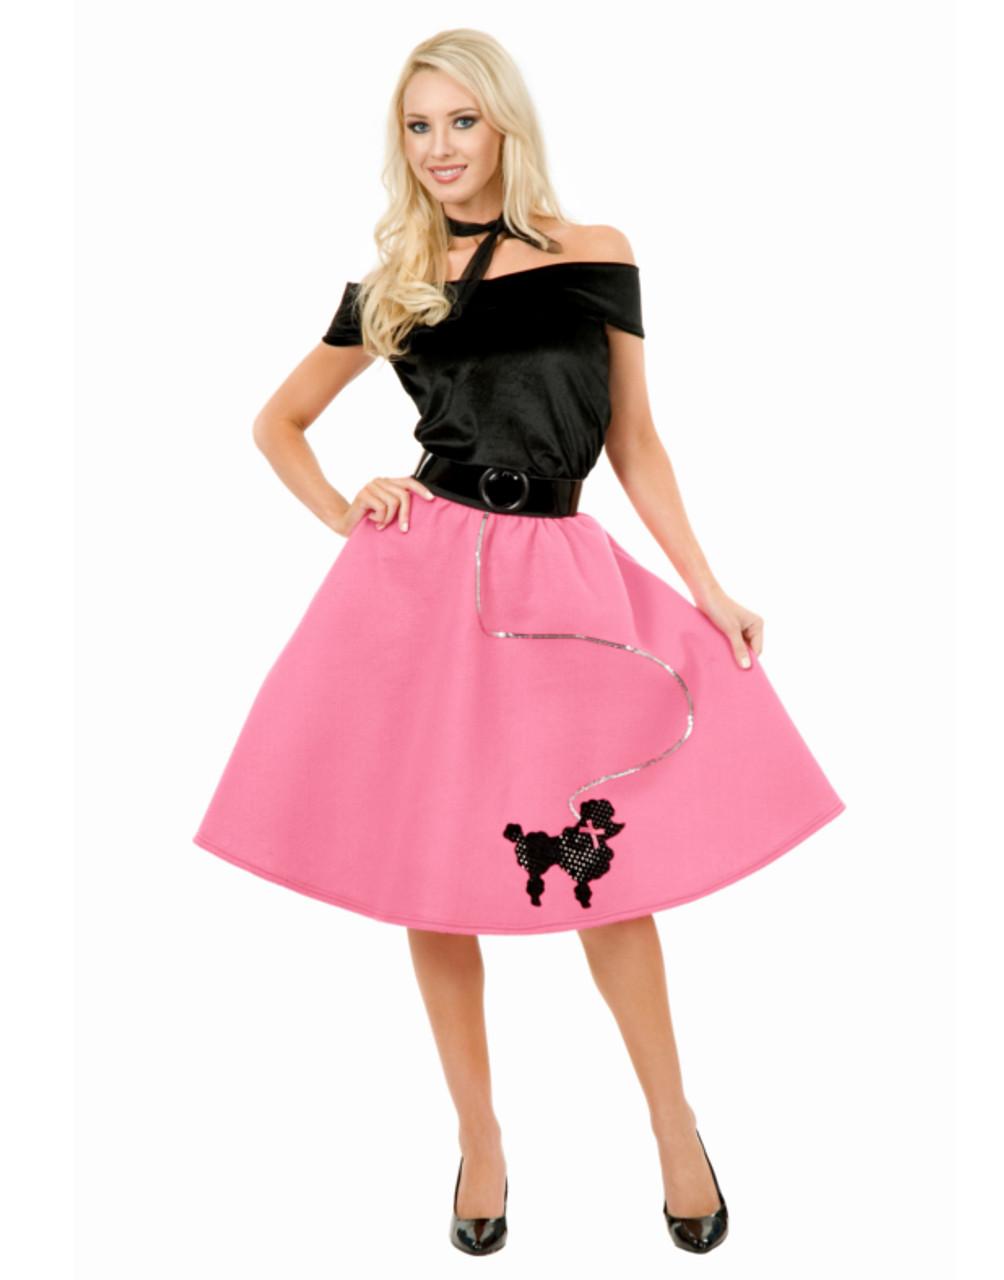 39b8a3f6729dc Womens Sexy Bubblegum Pink Poodle Skirt 50s Sock Hop Costume